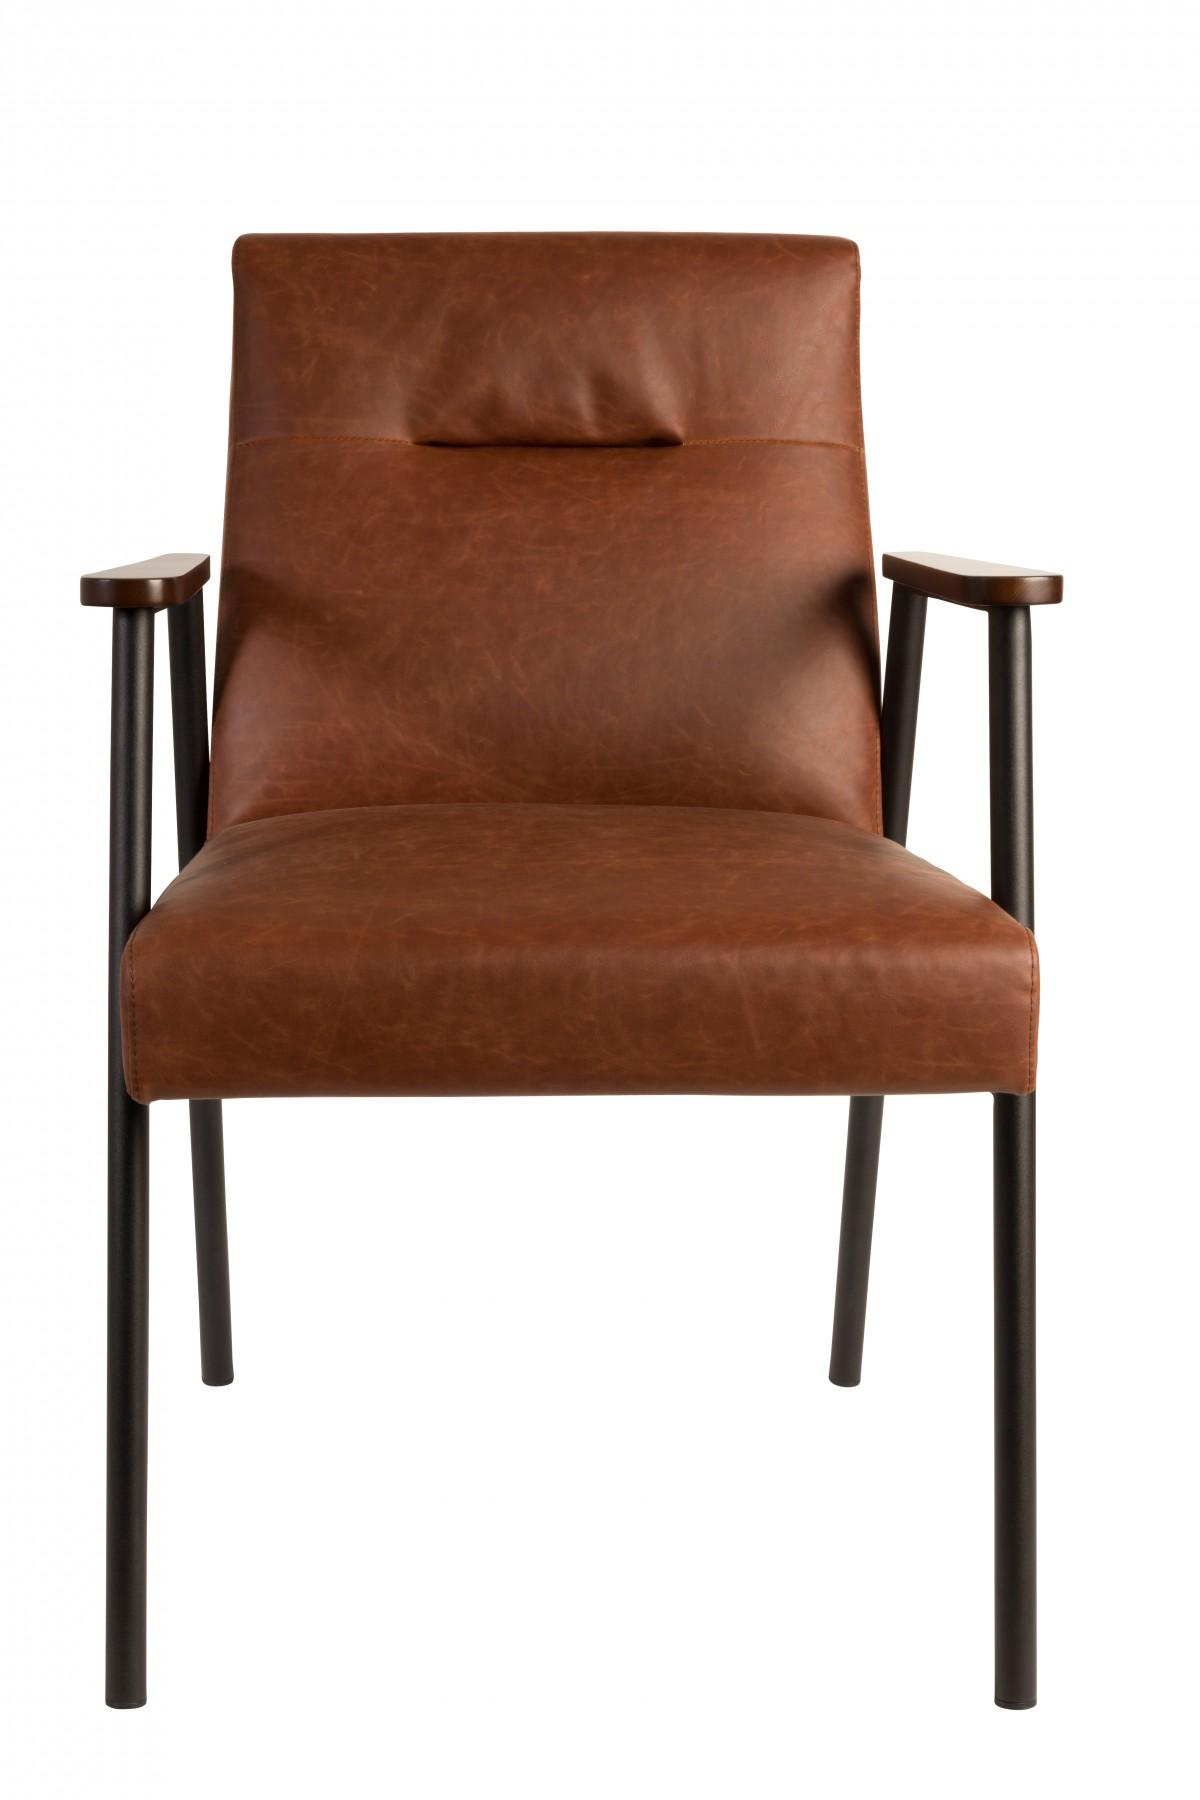 p m furniture custom made hospitality furniture. Black Bedroom Furniture Sets. Home Design Ideas